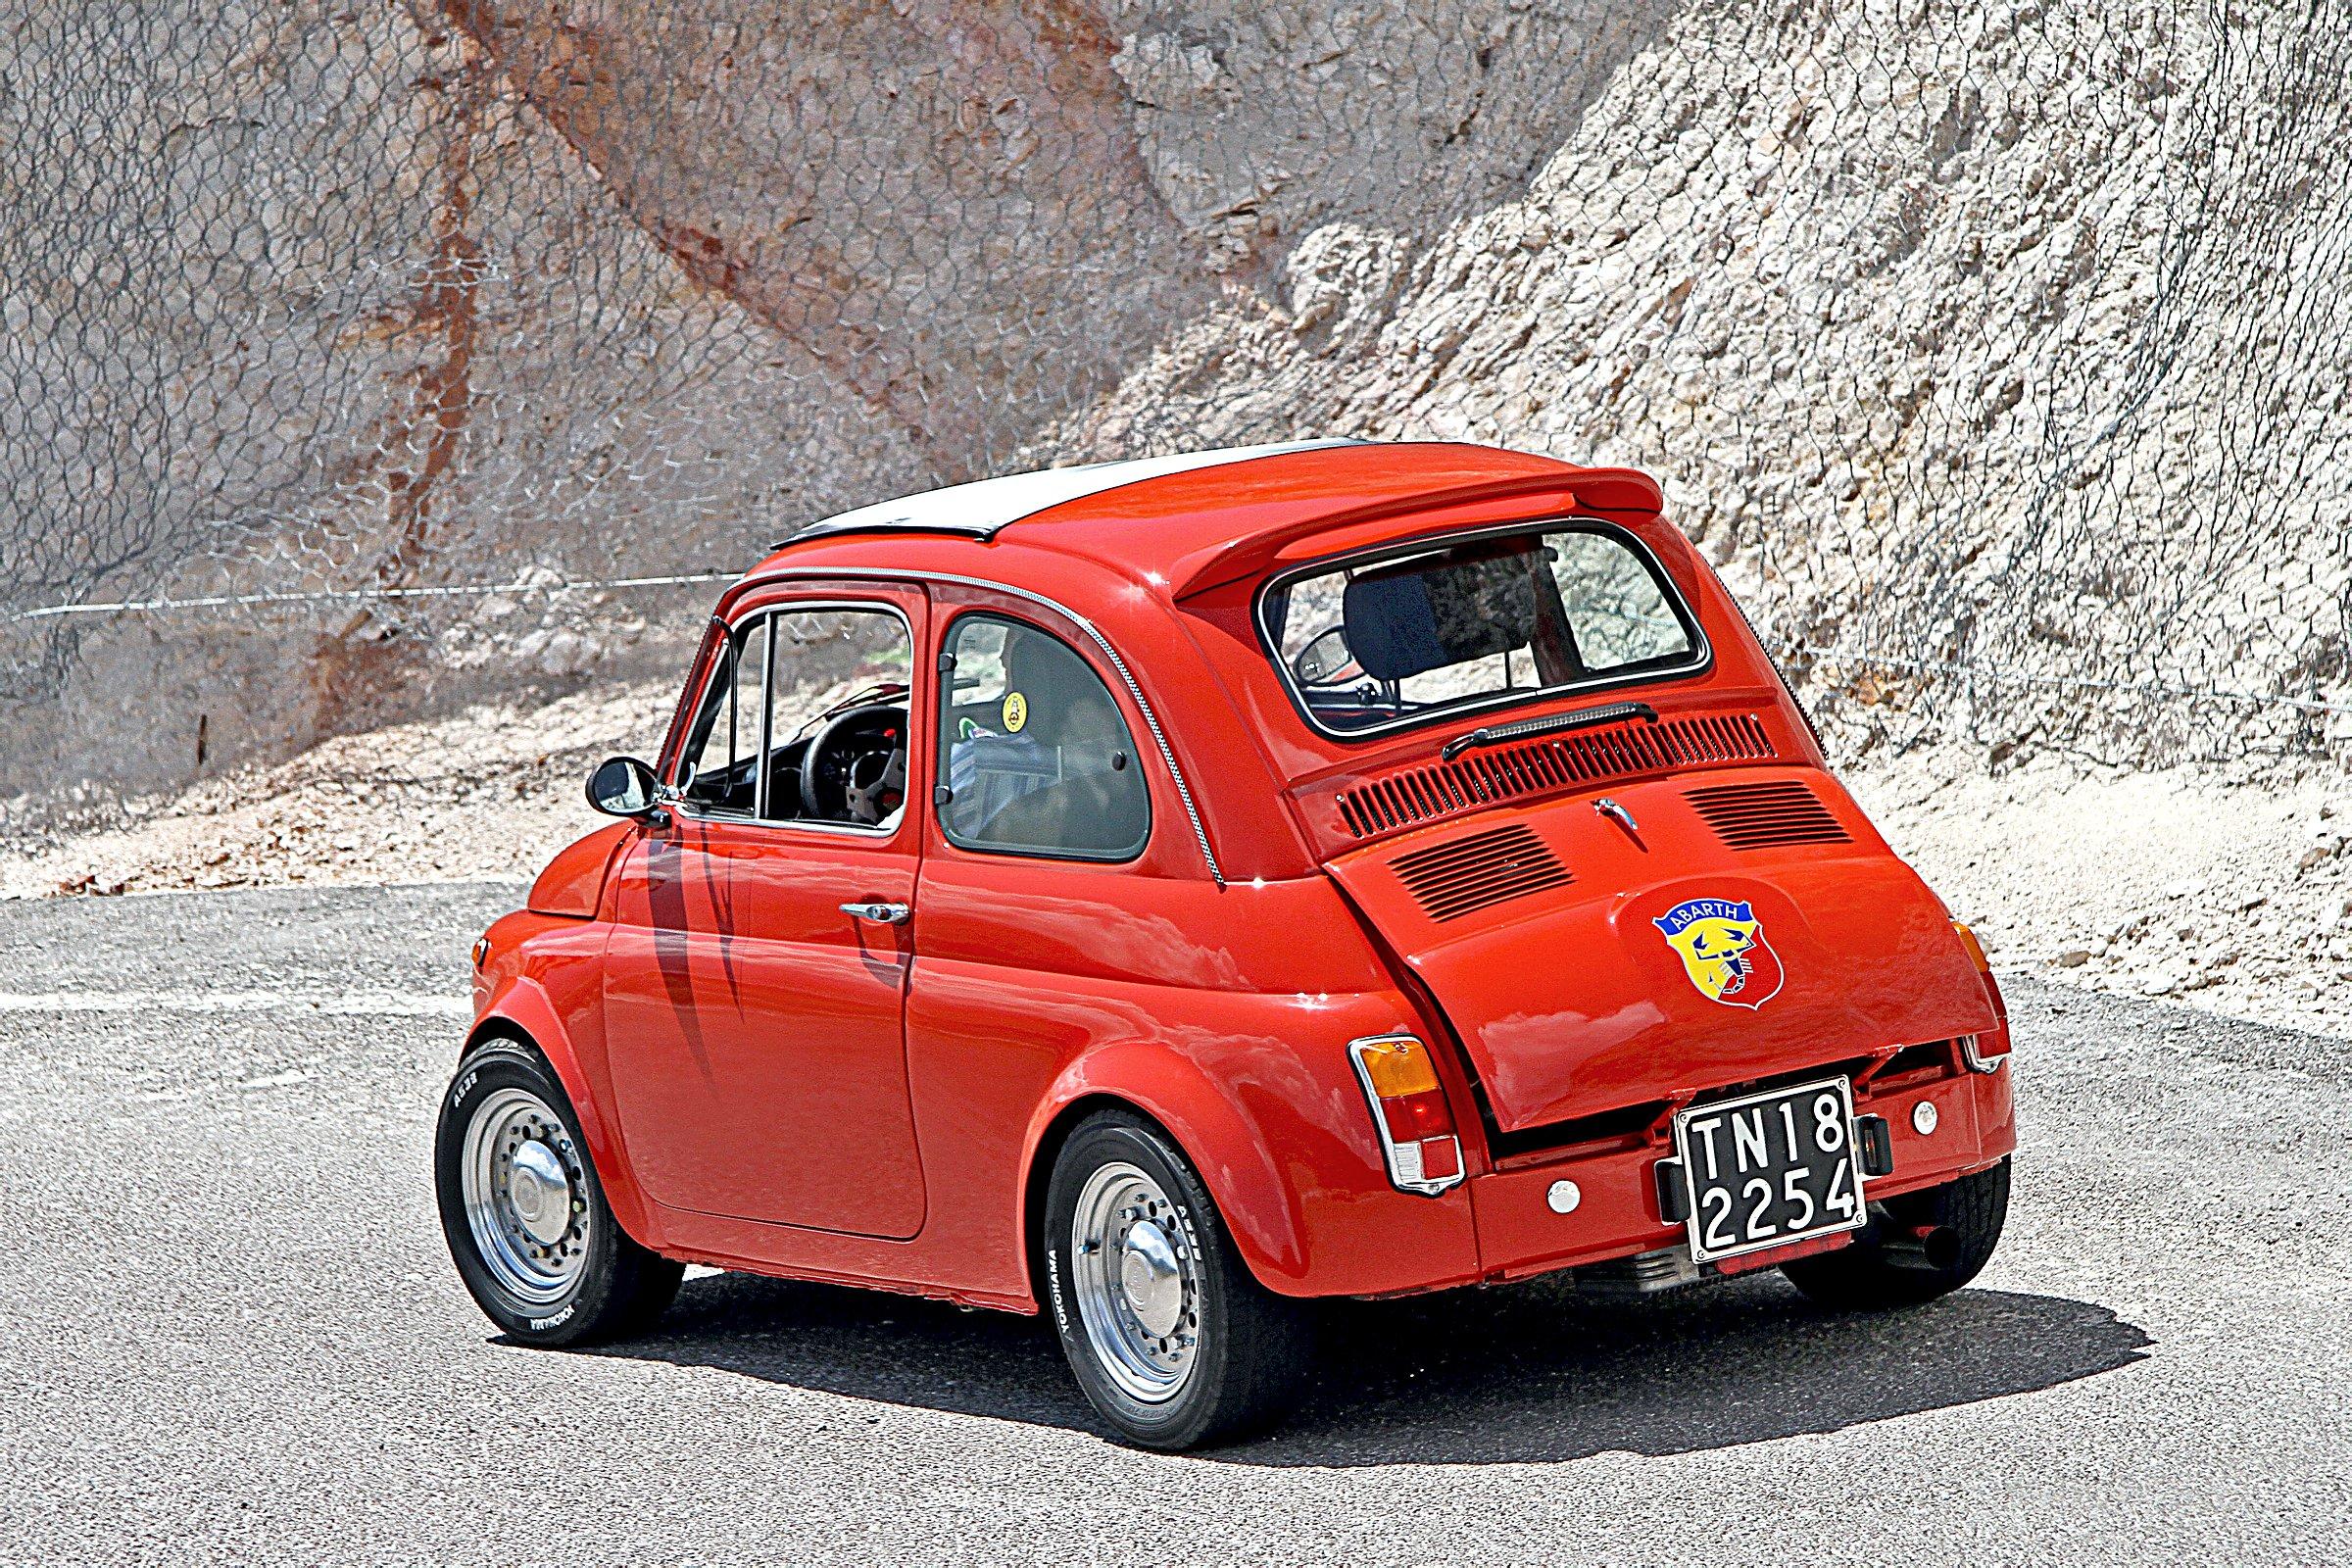 fiat cinquecento 500 595 abarth mk1 cars classic italia. Black Bedroom Furniture Sets. Home Design Ideas